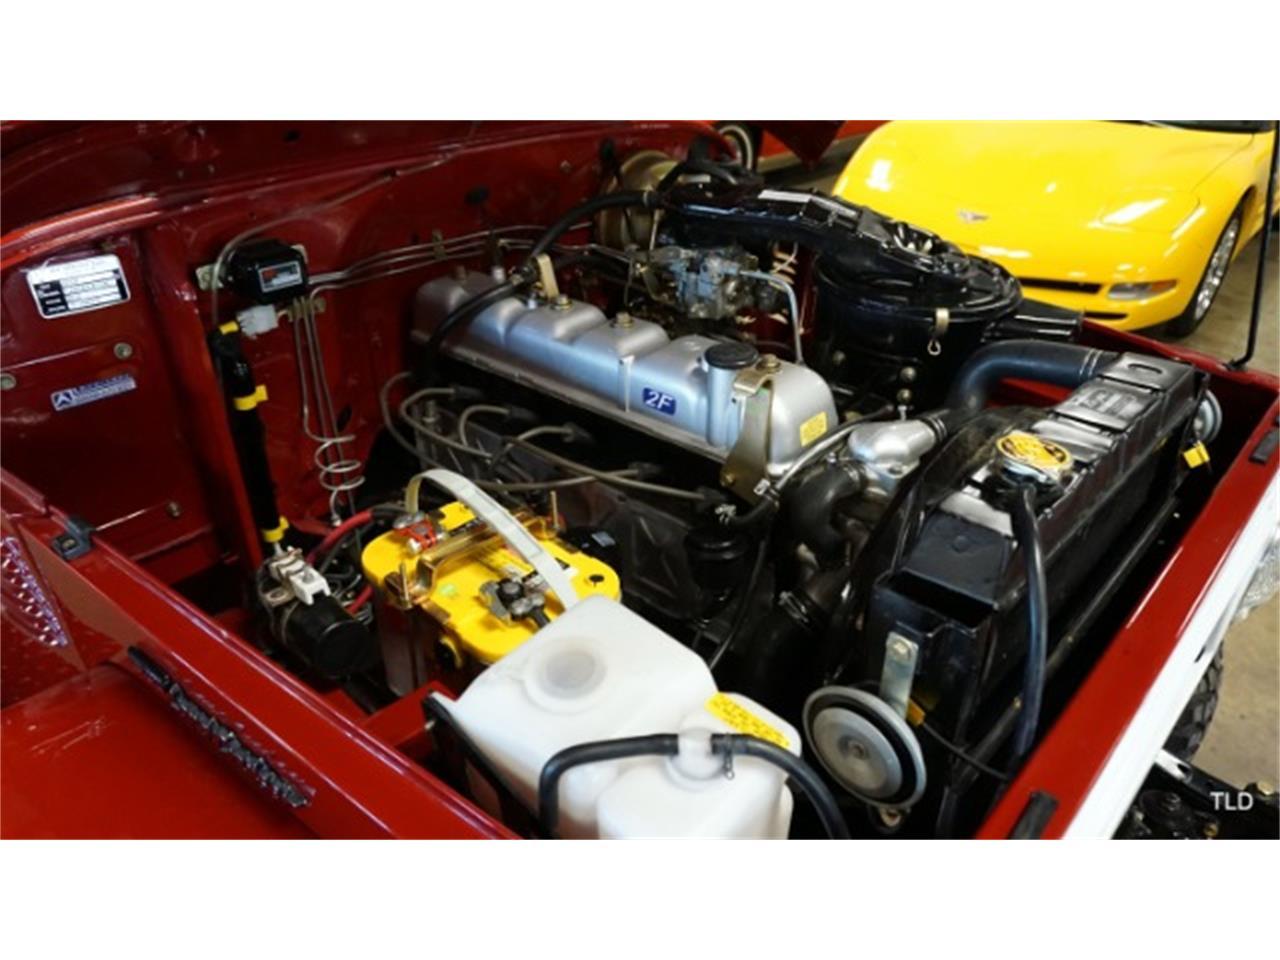 Large Picture of '78 Toyota Land Cruiser FJ - $42,000.00 - QK64